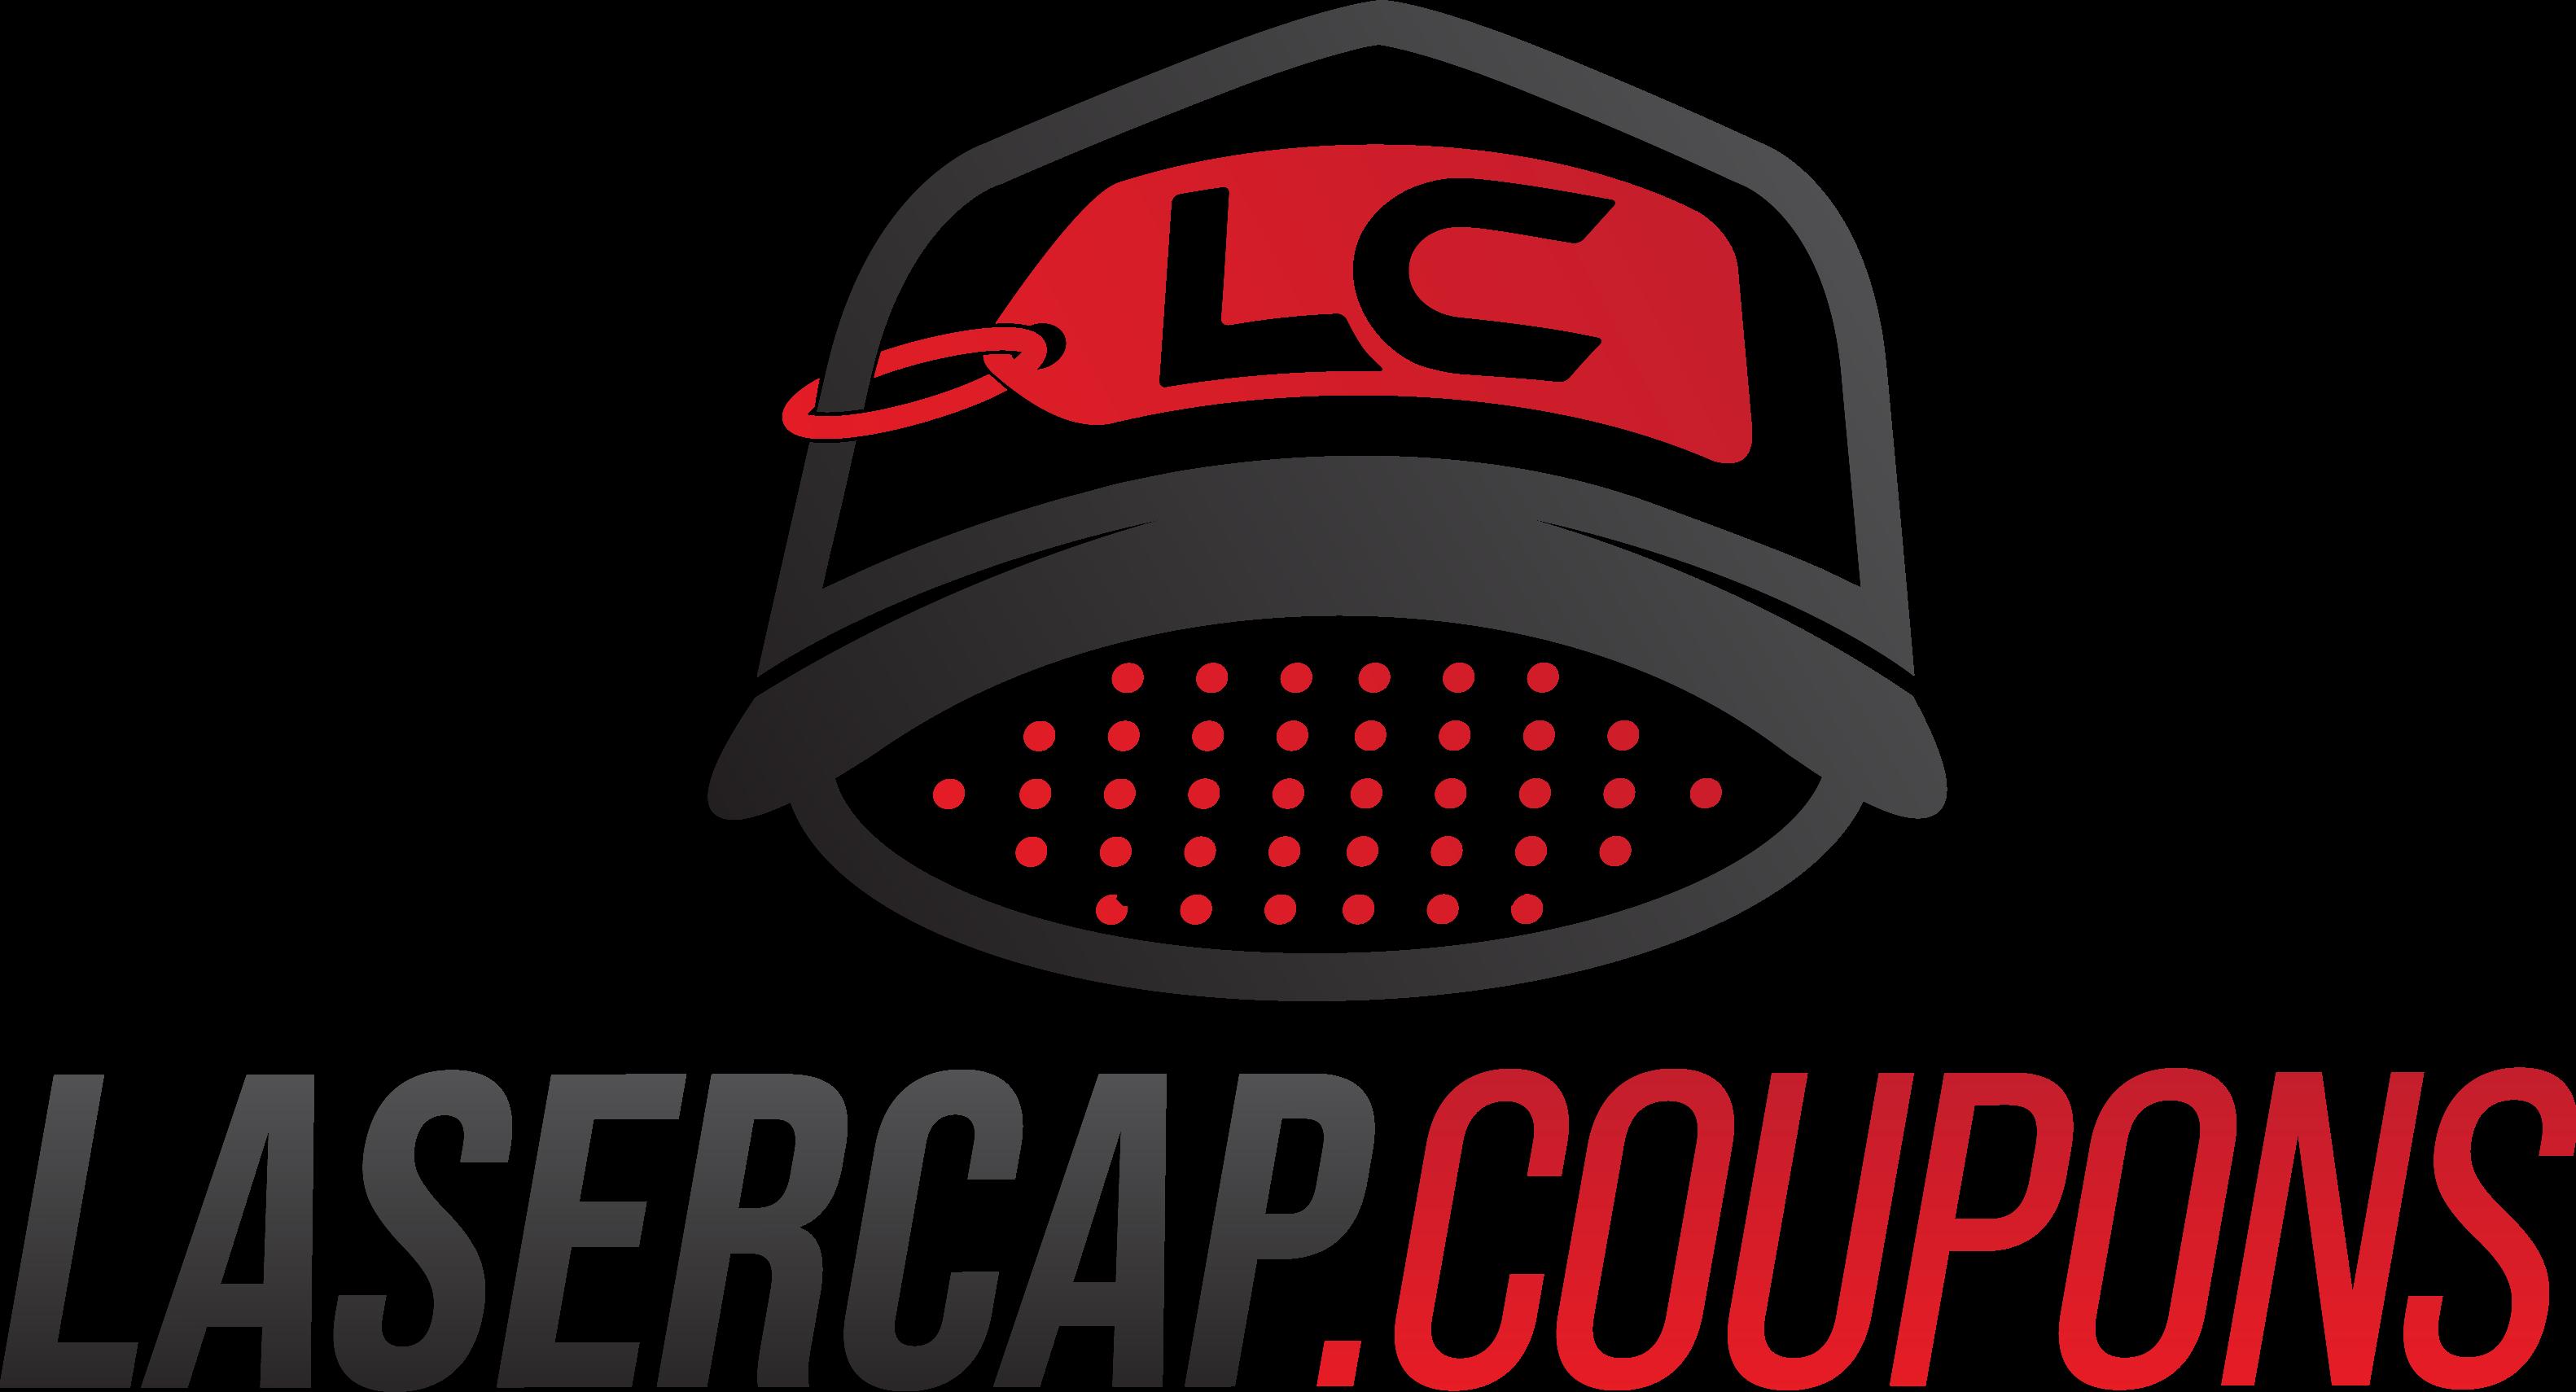 Best Laser Cap Coupons